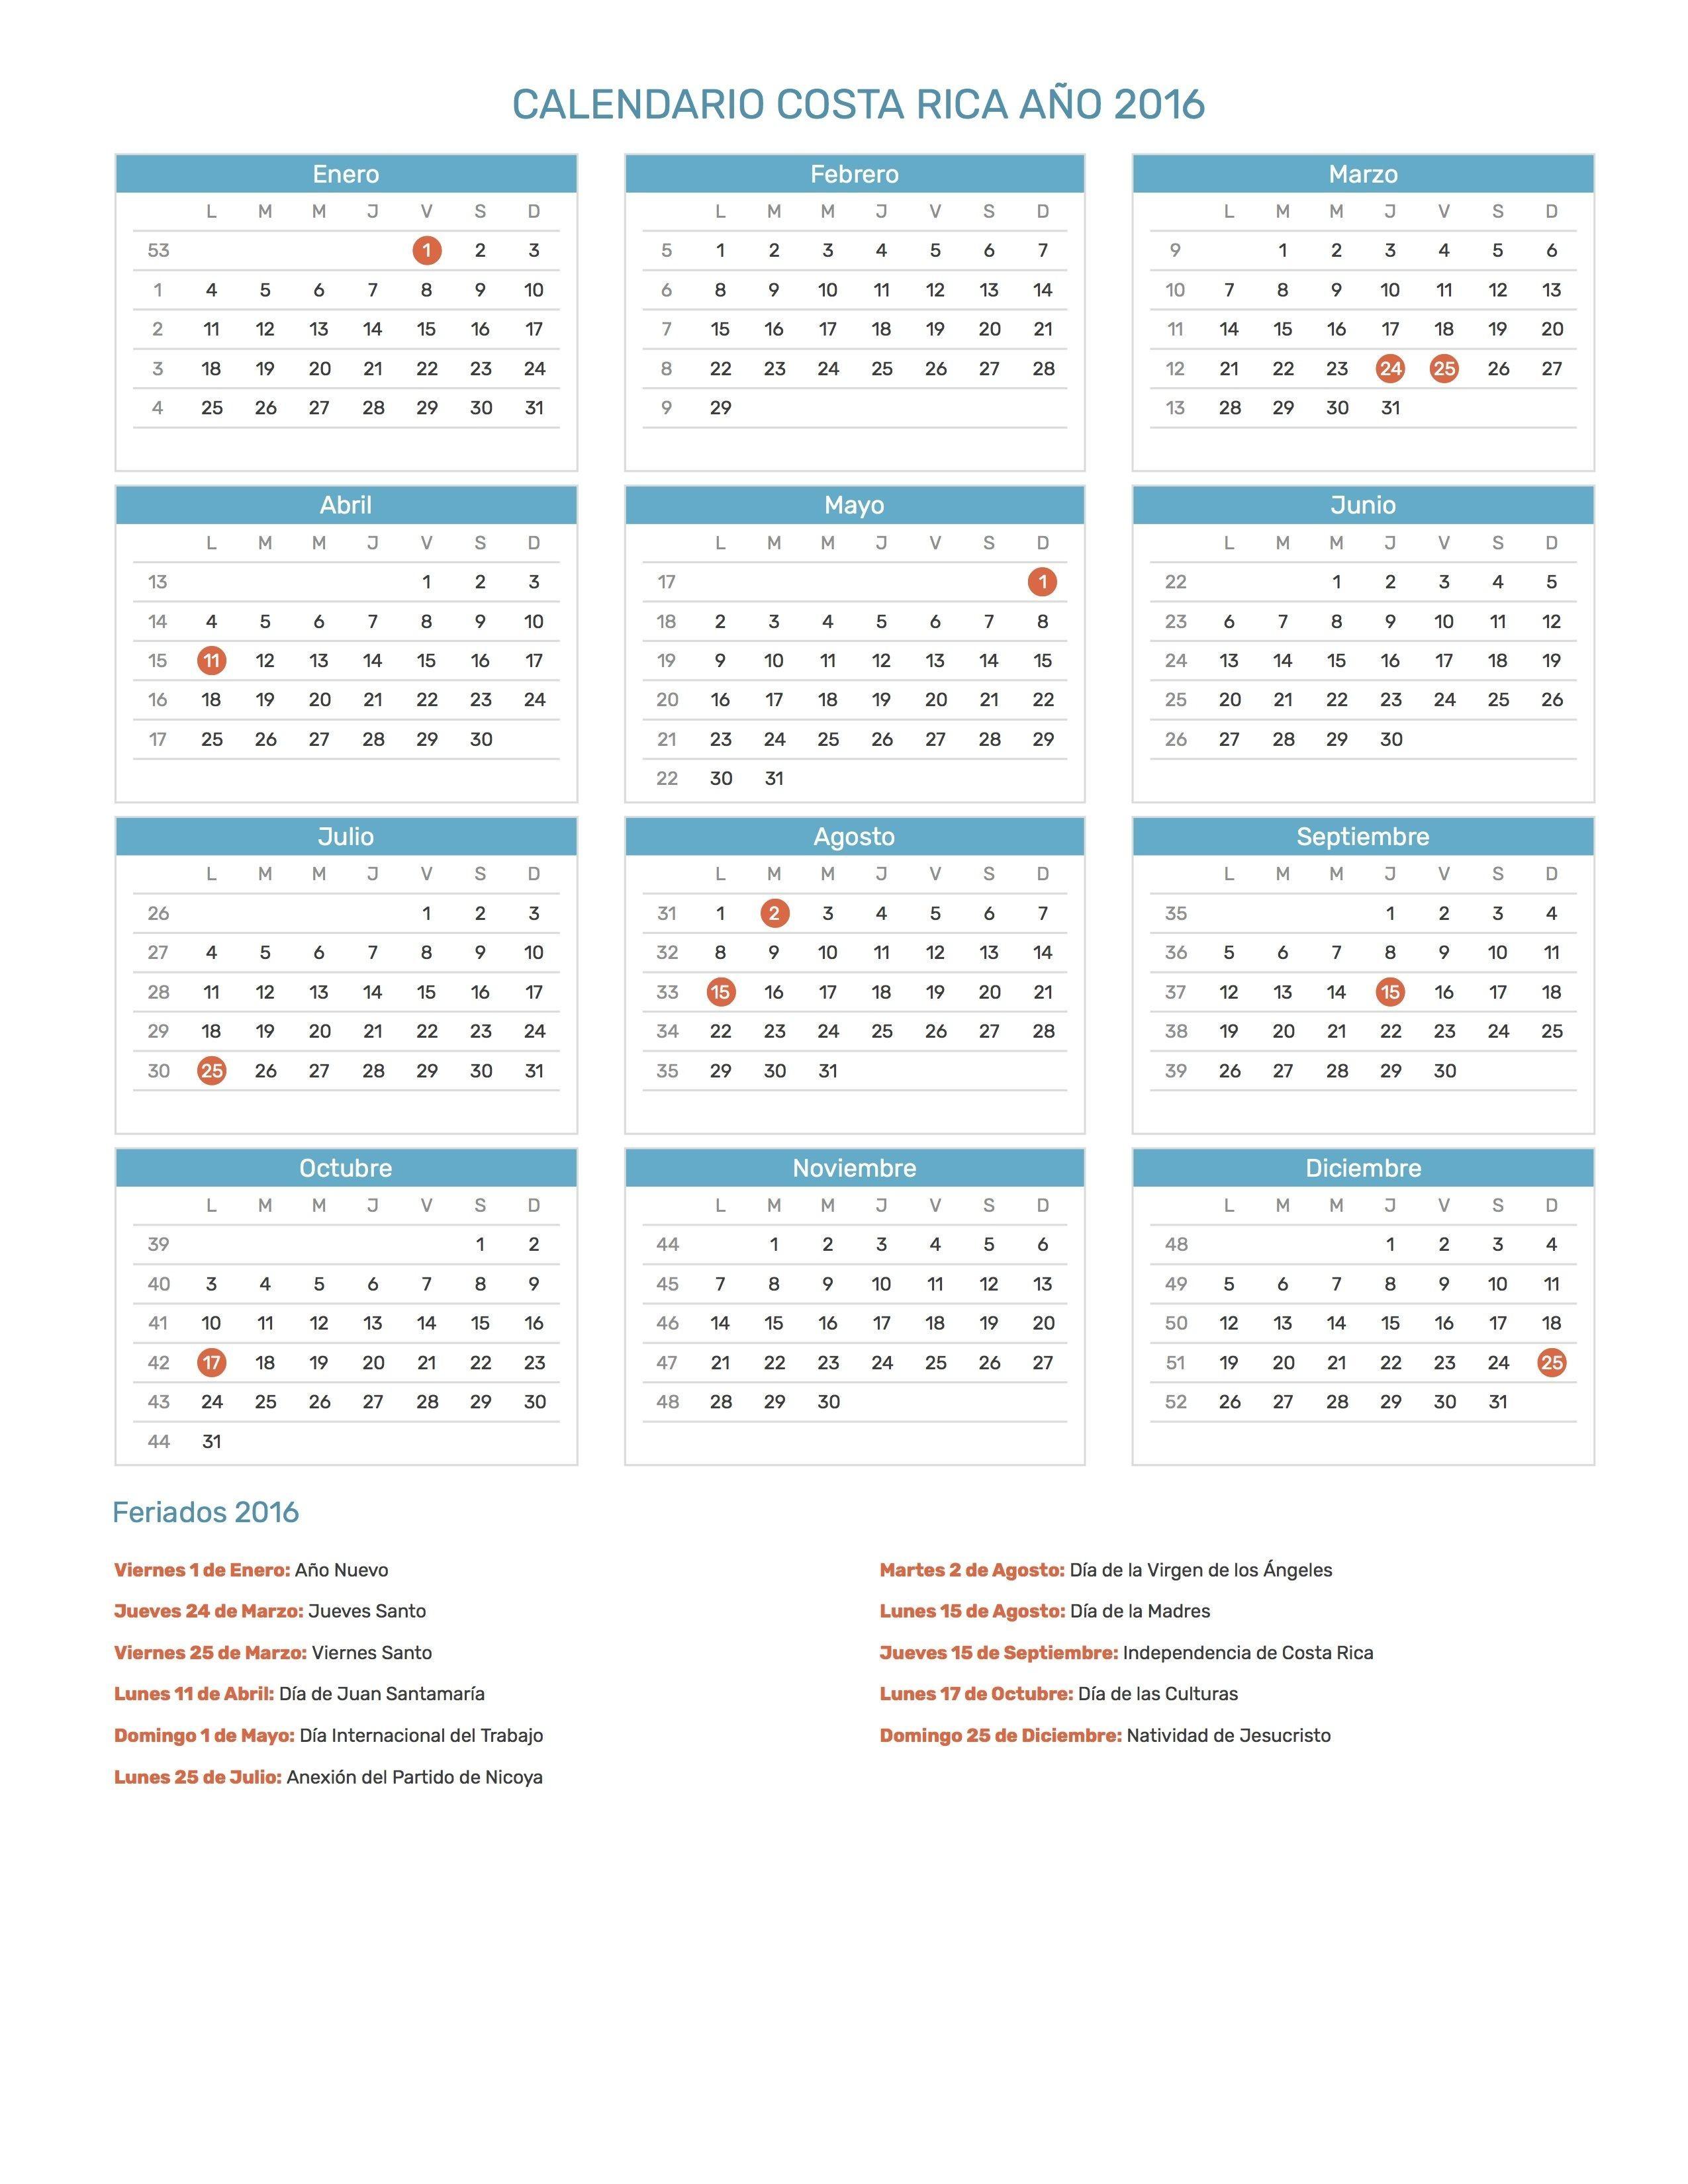 Calendario Agosto Septiembre 2019 Recientes Determinar Calendario Septiembre 2019 Para Imprimir Mexico Of Calendario Agosto Septiembre 2019 Más Recientes Peri³dico Abc 1 De Agosto De 2018 Pages 1 16 Text Version